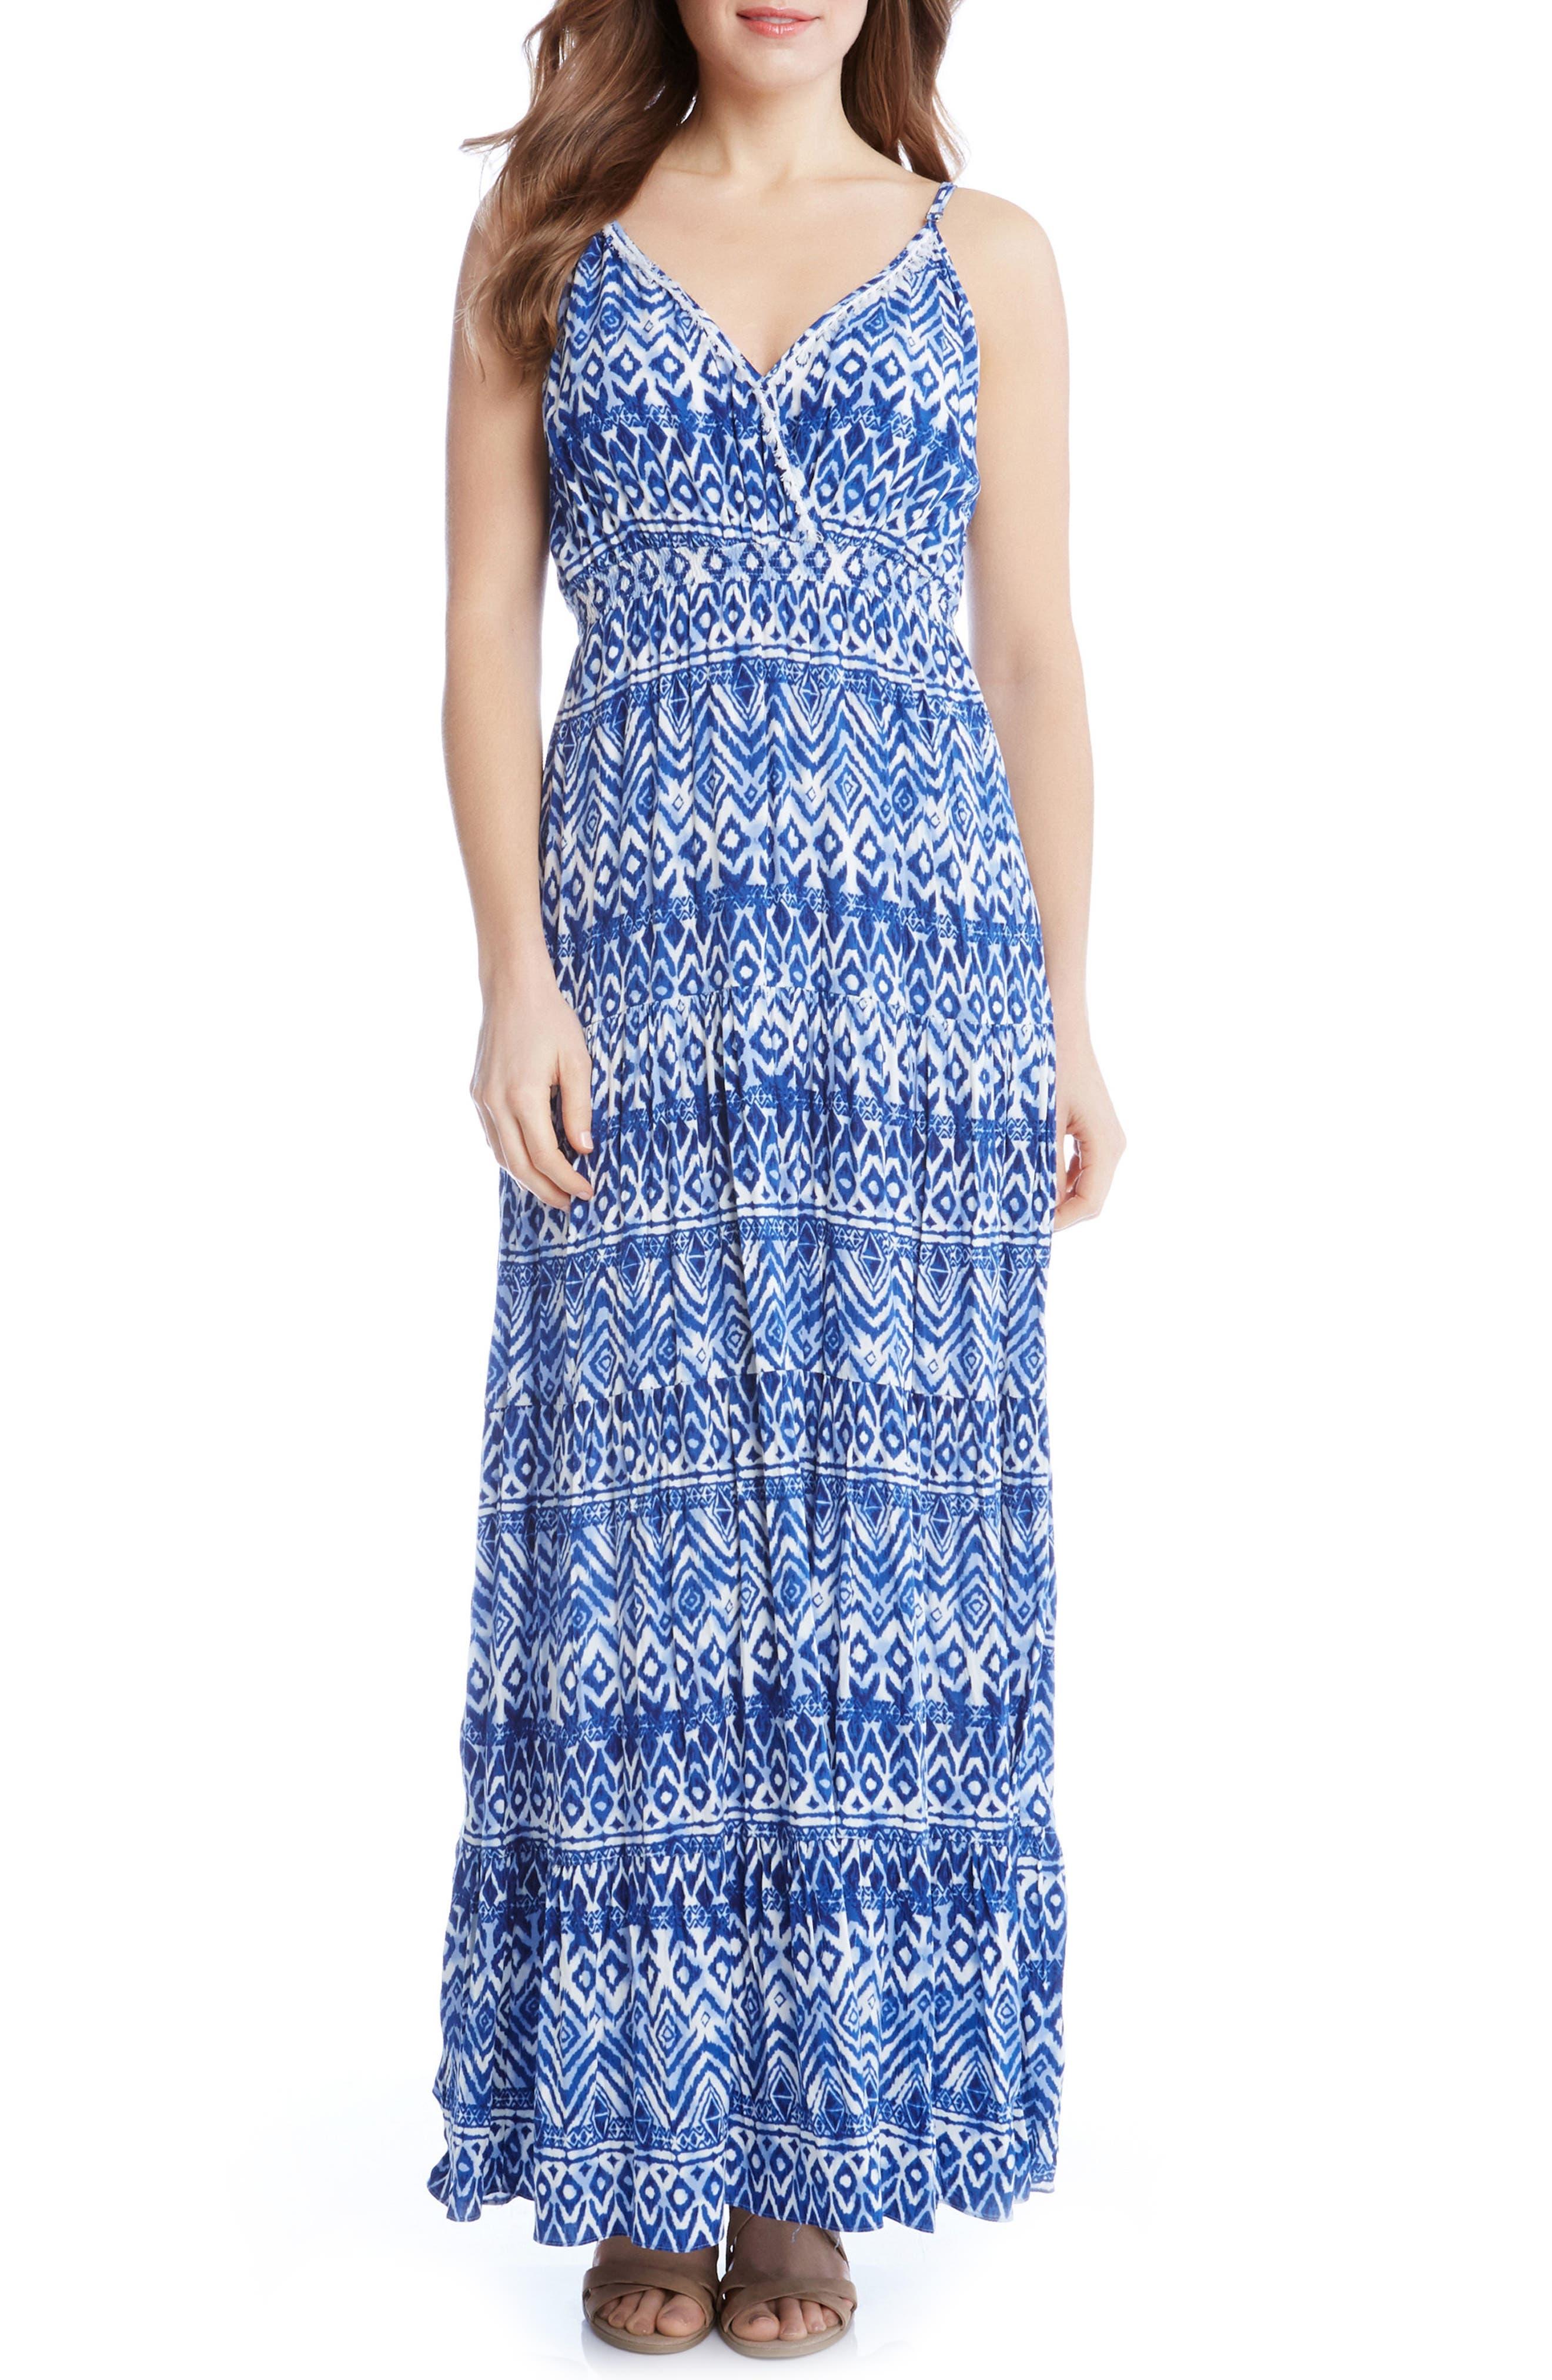 Batik Print Tiered Maxi Dress,                             Main thumbnail 1, color,                             460